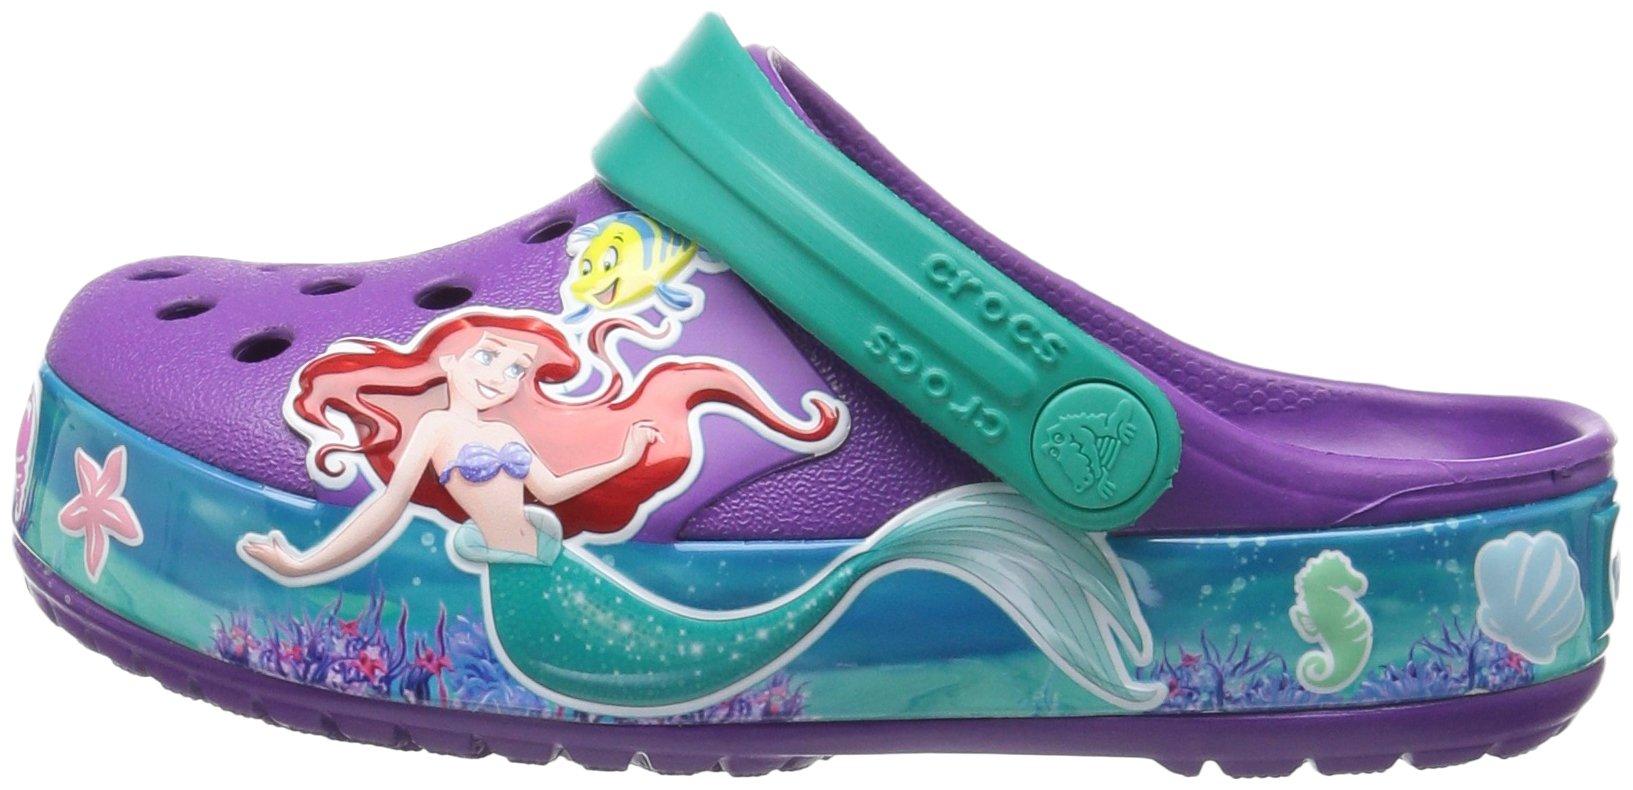 Crocs Girls' CB Princess Ariel K Clog, Amethyst, 13 M US Little Kid by Crocs (Image #5)